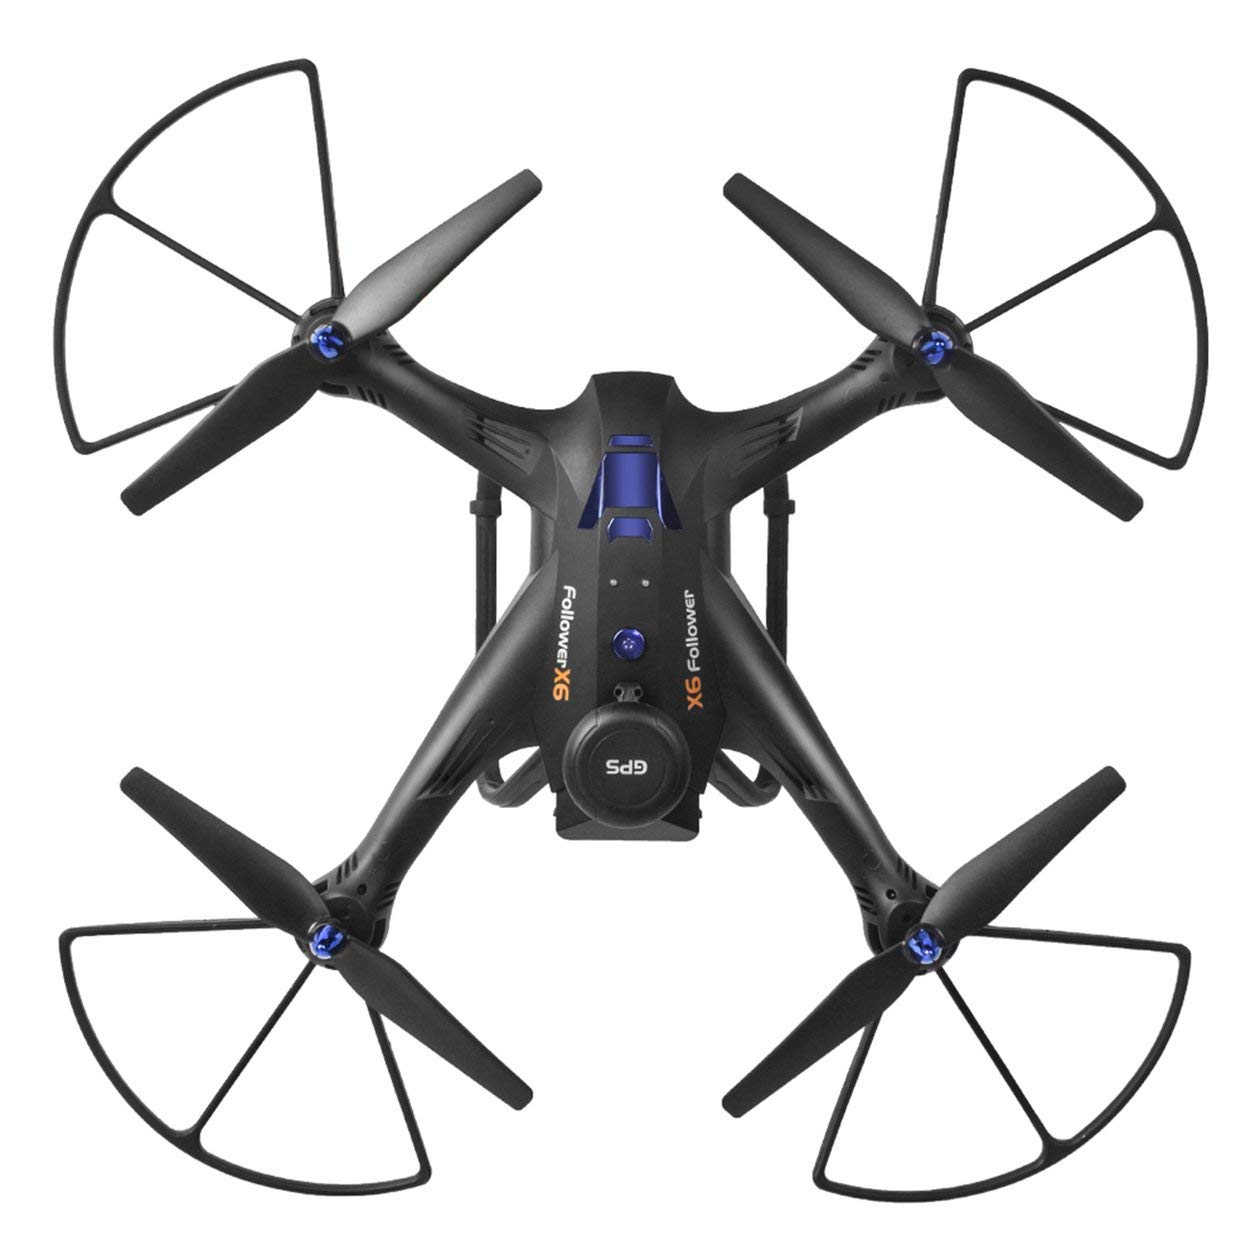 HONZIRY Xinlin SHIYE X183 5.8G Dual GPS RC Quadcopter Drone ...